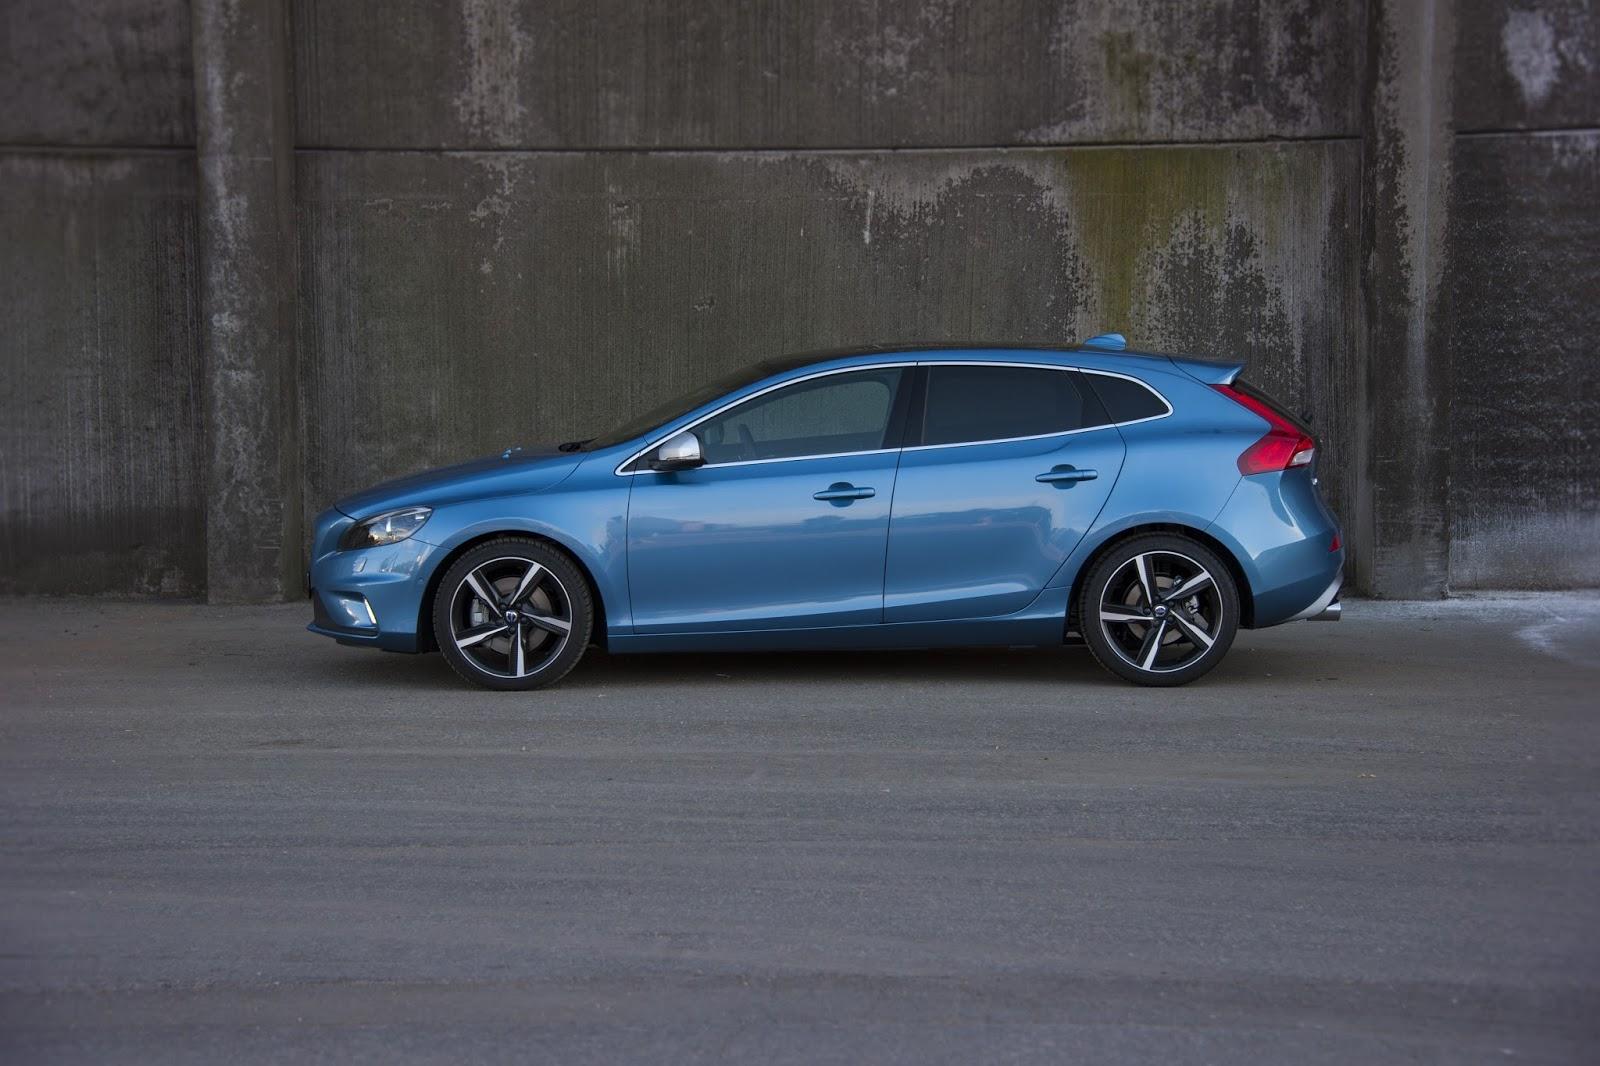 VOLVO%2BV40%2B1.5%2BT3%2BAUTO 4 Το Volvo V40 Cross Country με το νέο κινητήρα 1,5 λίτρων, απόδοσης 152 ίππων από 21.900 €